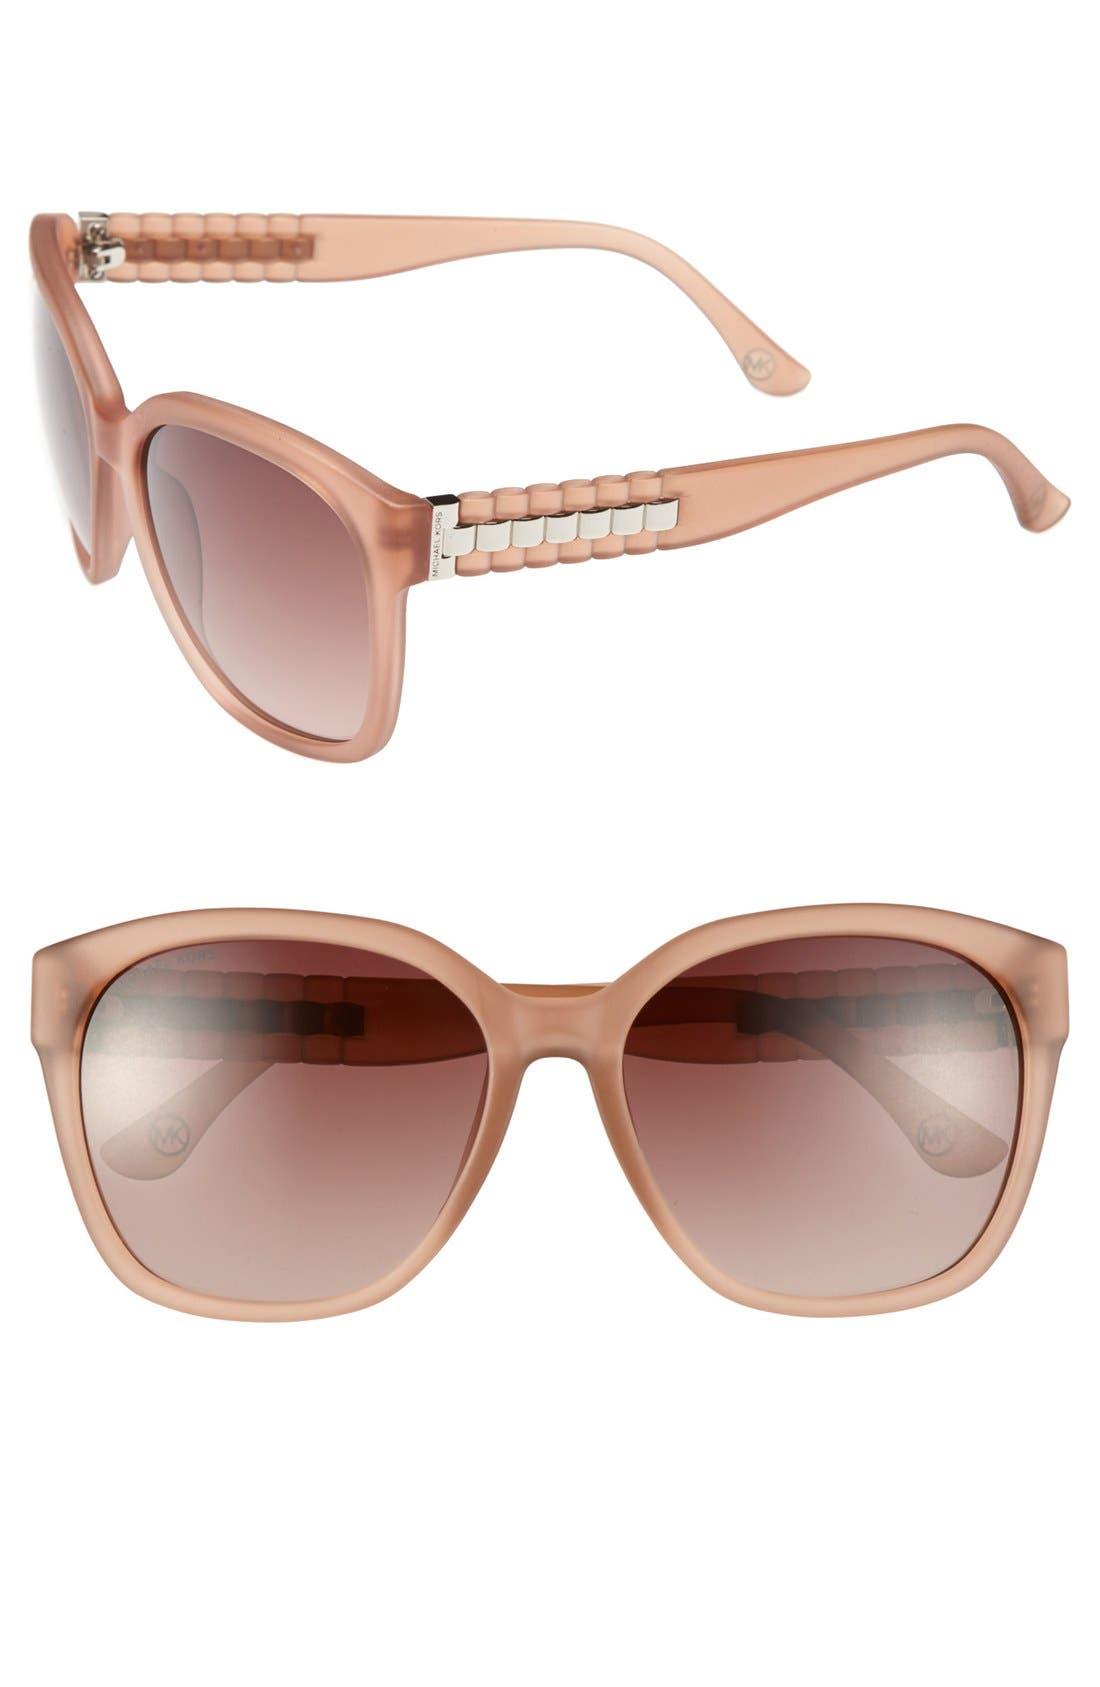 33f93ad6a2 Buy michael kors natalia sunglasses   OFF77% Discounted